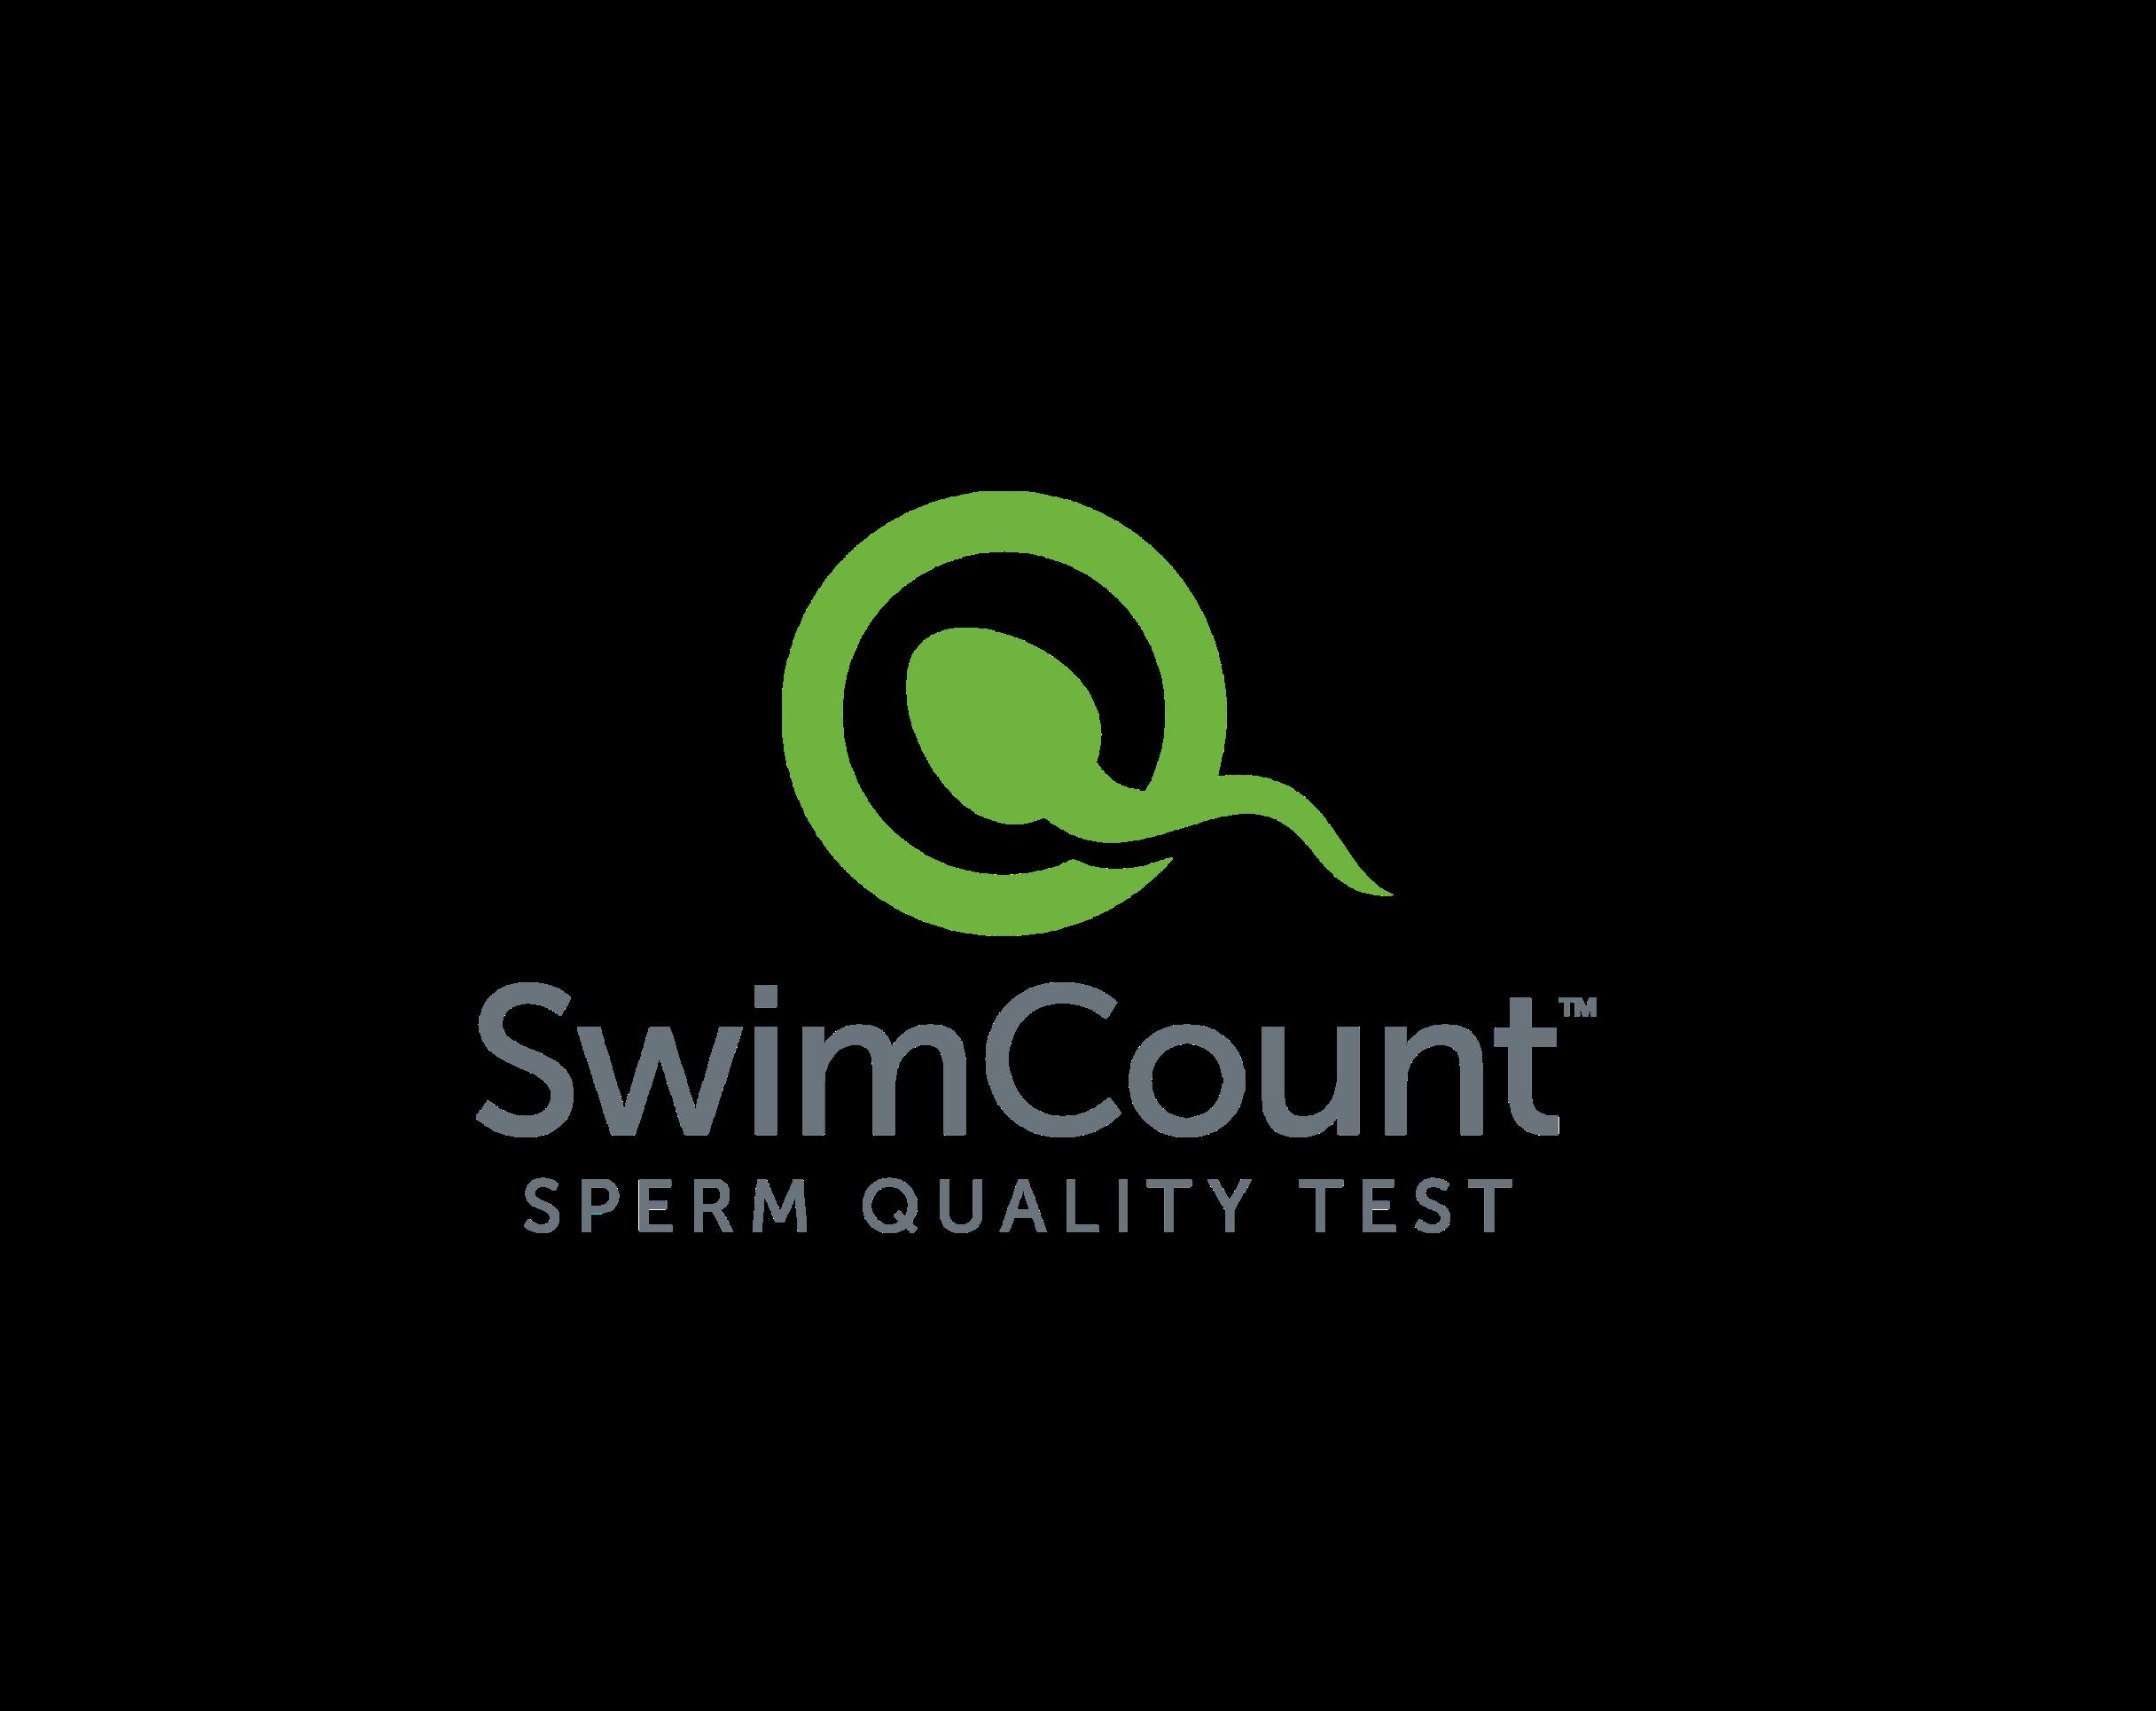 https://hospitex.com/wp-content/uploads/2019/12/ENG_SwimCount-1.png